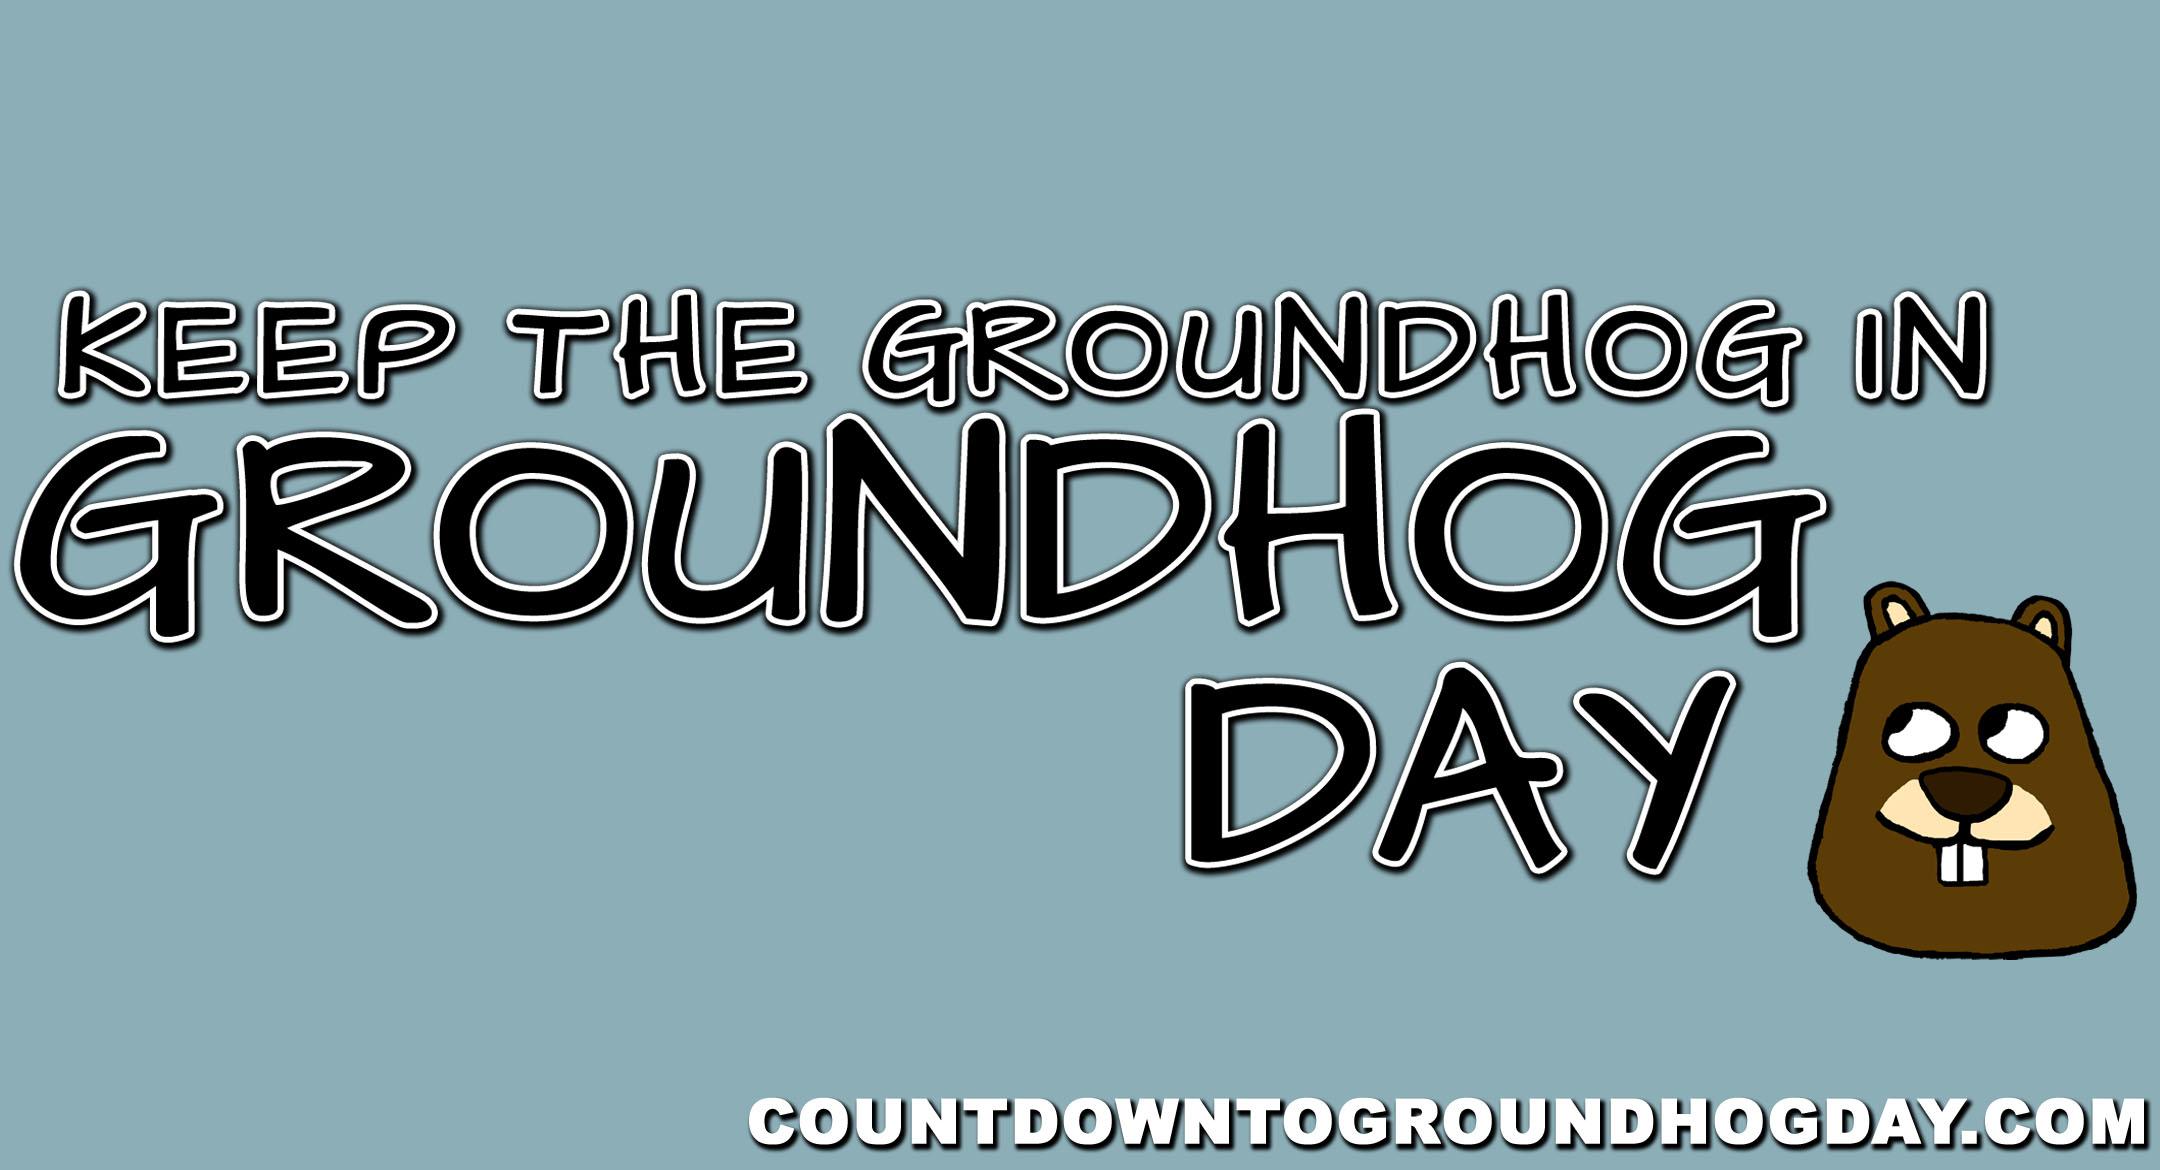 Keep the Groundhog in Groundhog Day